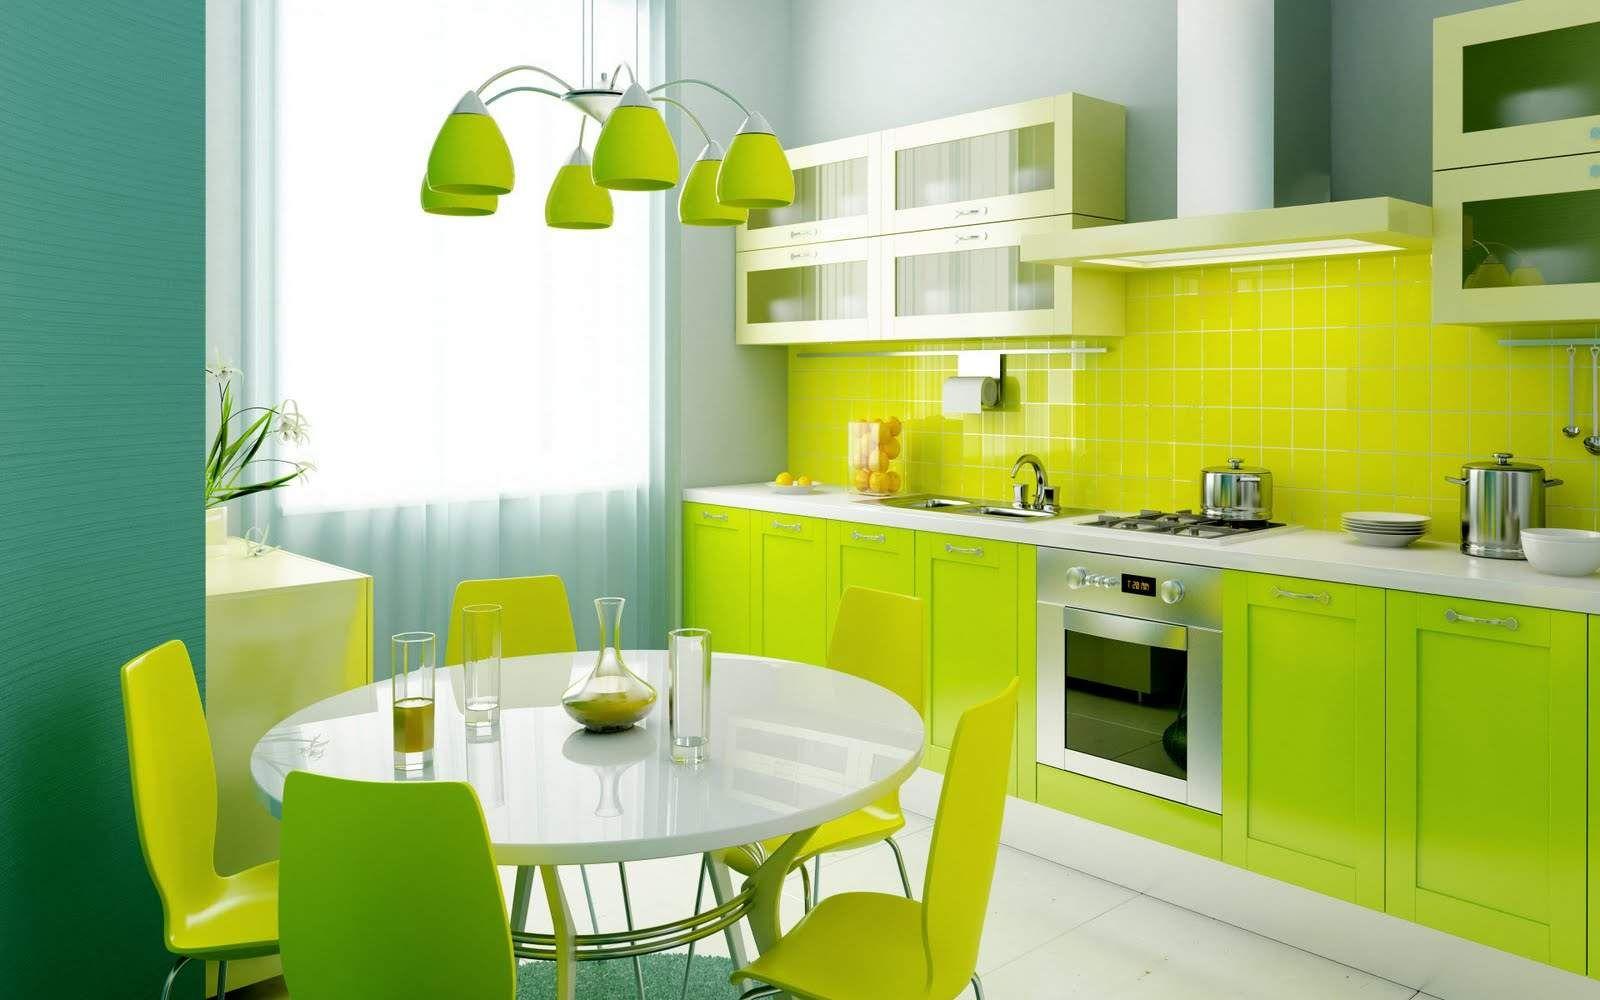 Virtuvės Interjeras Kokį Rinktis Manopomegiai Lt Yellow Kitchen Designs Green Kitchen Designs Green Kitchen Cabinets